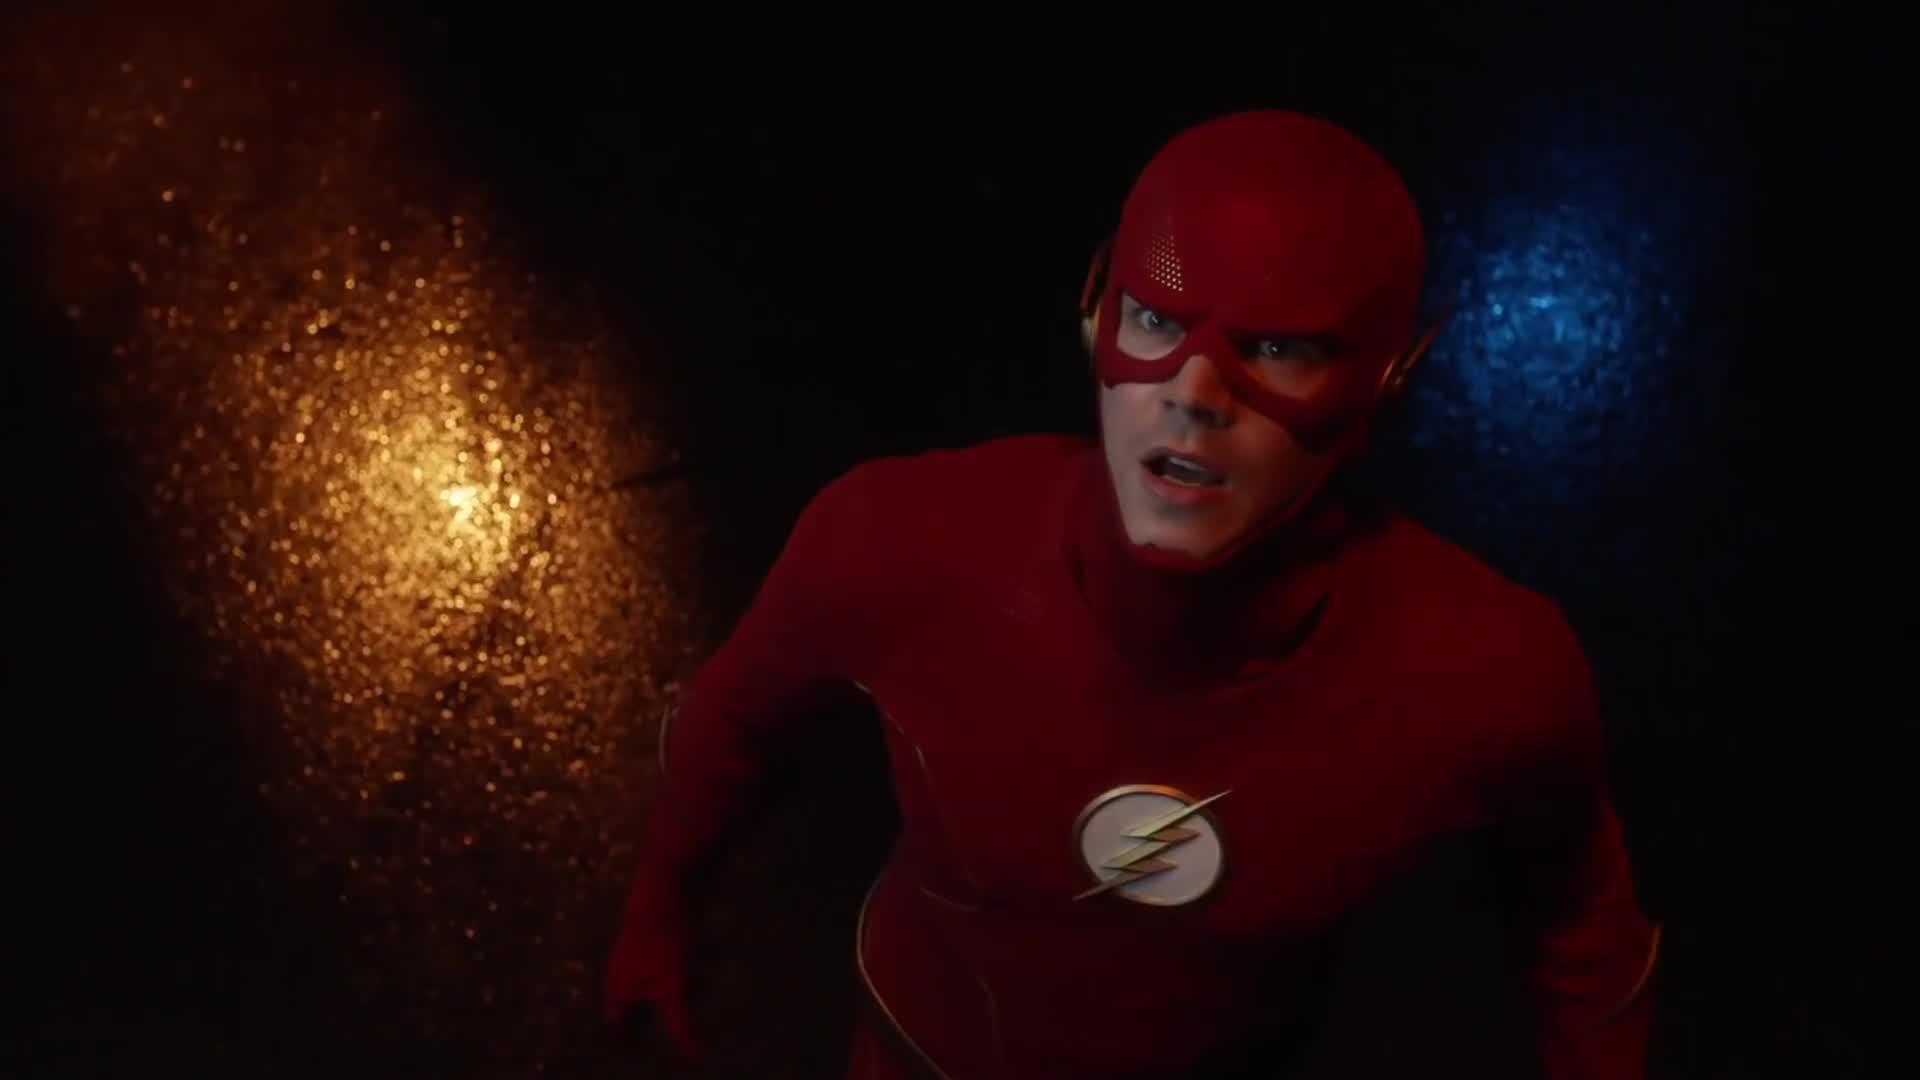 Flash season 1 full episodes download torrent free